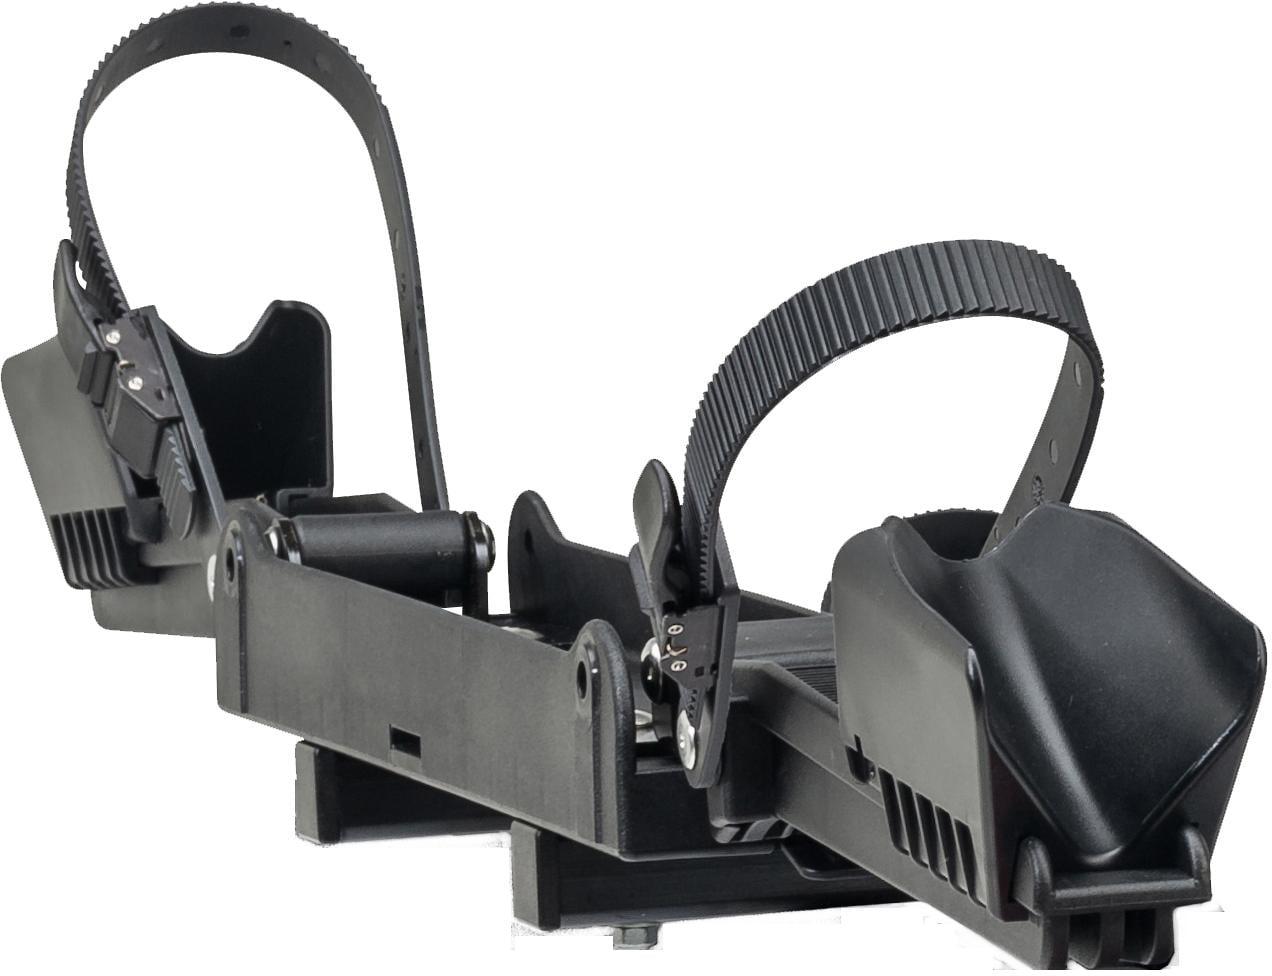 westfalia automotive erweiterung 3 rad f r fahrradtr ger. Black Bedroom Furniture Sets. Home Design Ideas